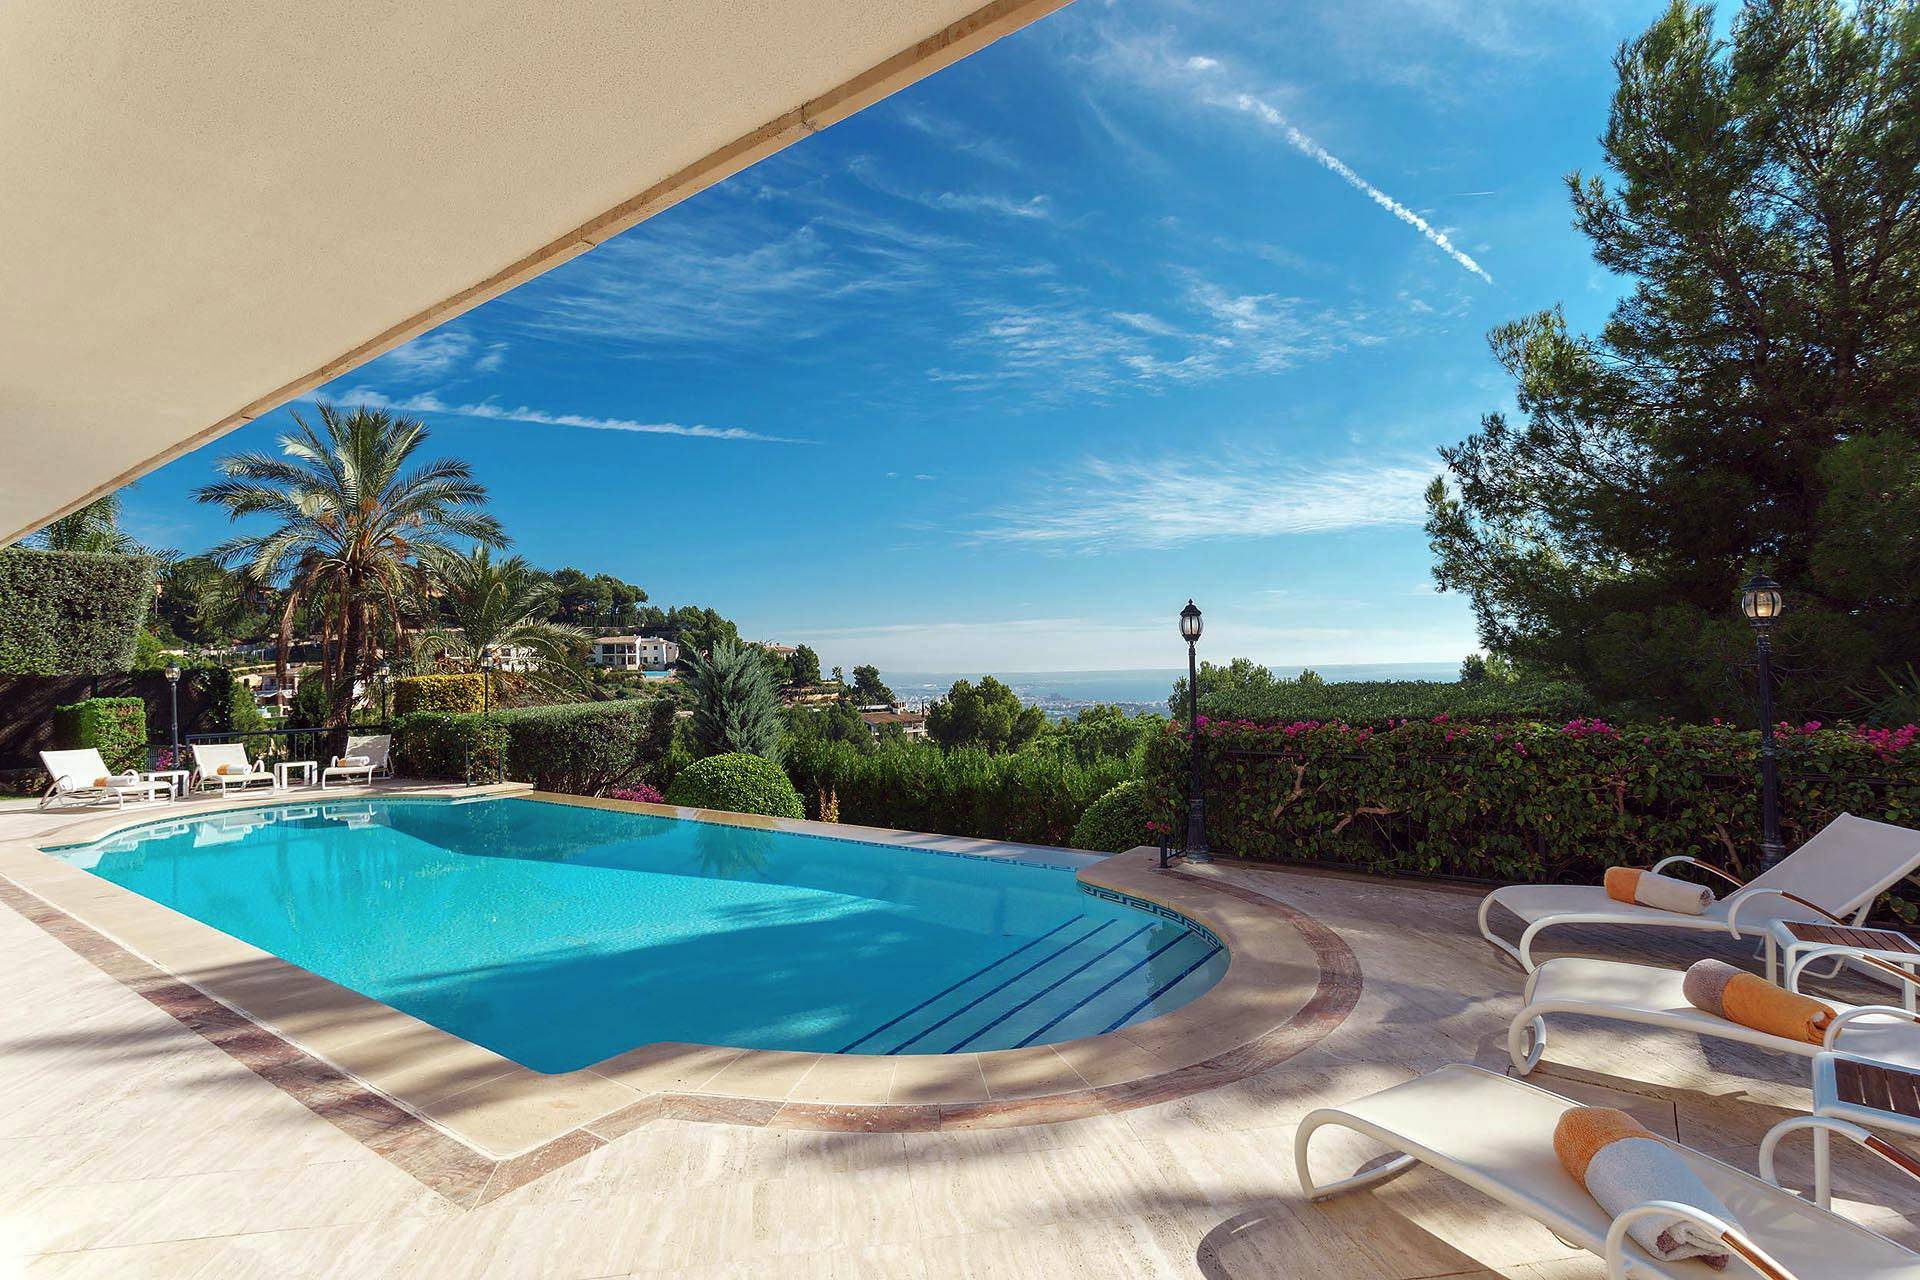 01-280 großzügige Villa nahe Palma de Mallorca Bild 2